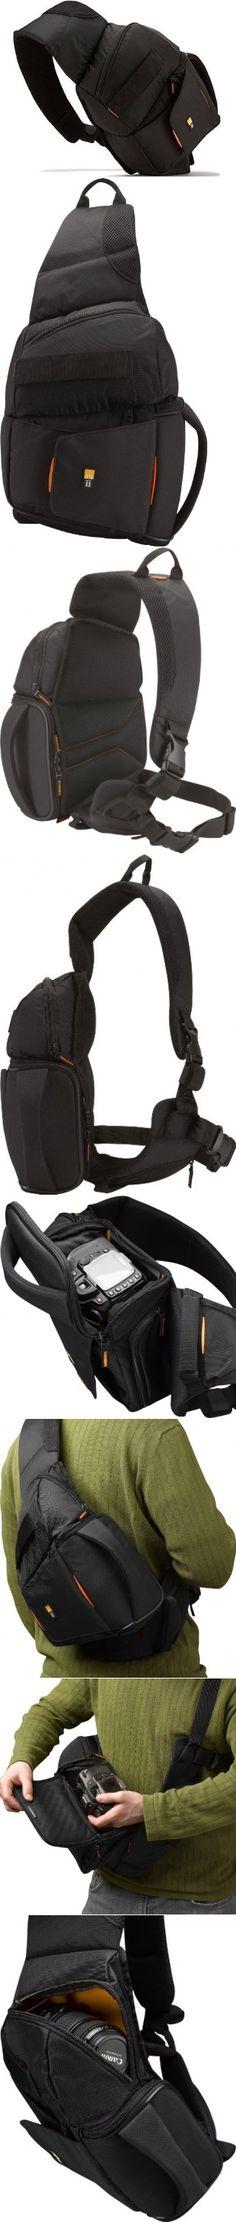 Case Logic SLRC-205 SLR Camera Sling (Black)